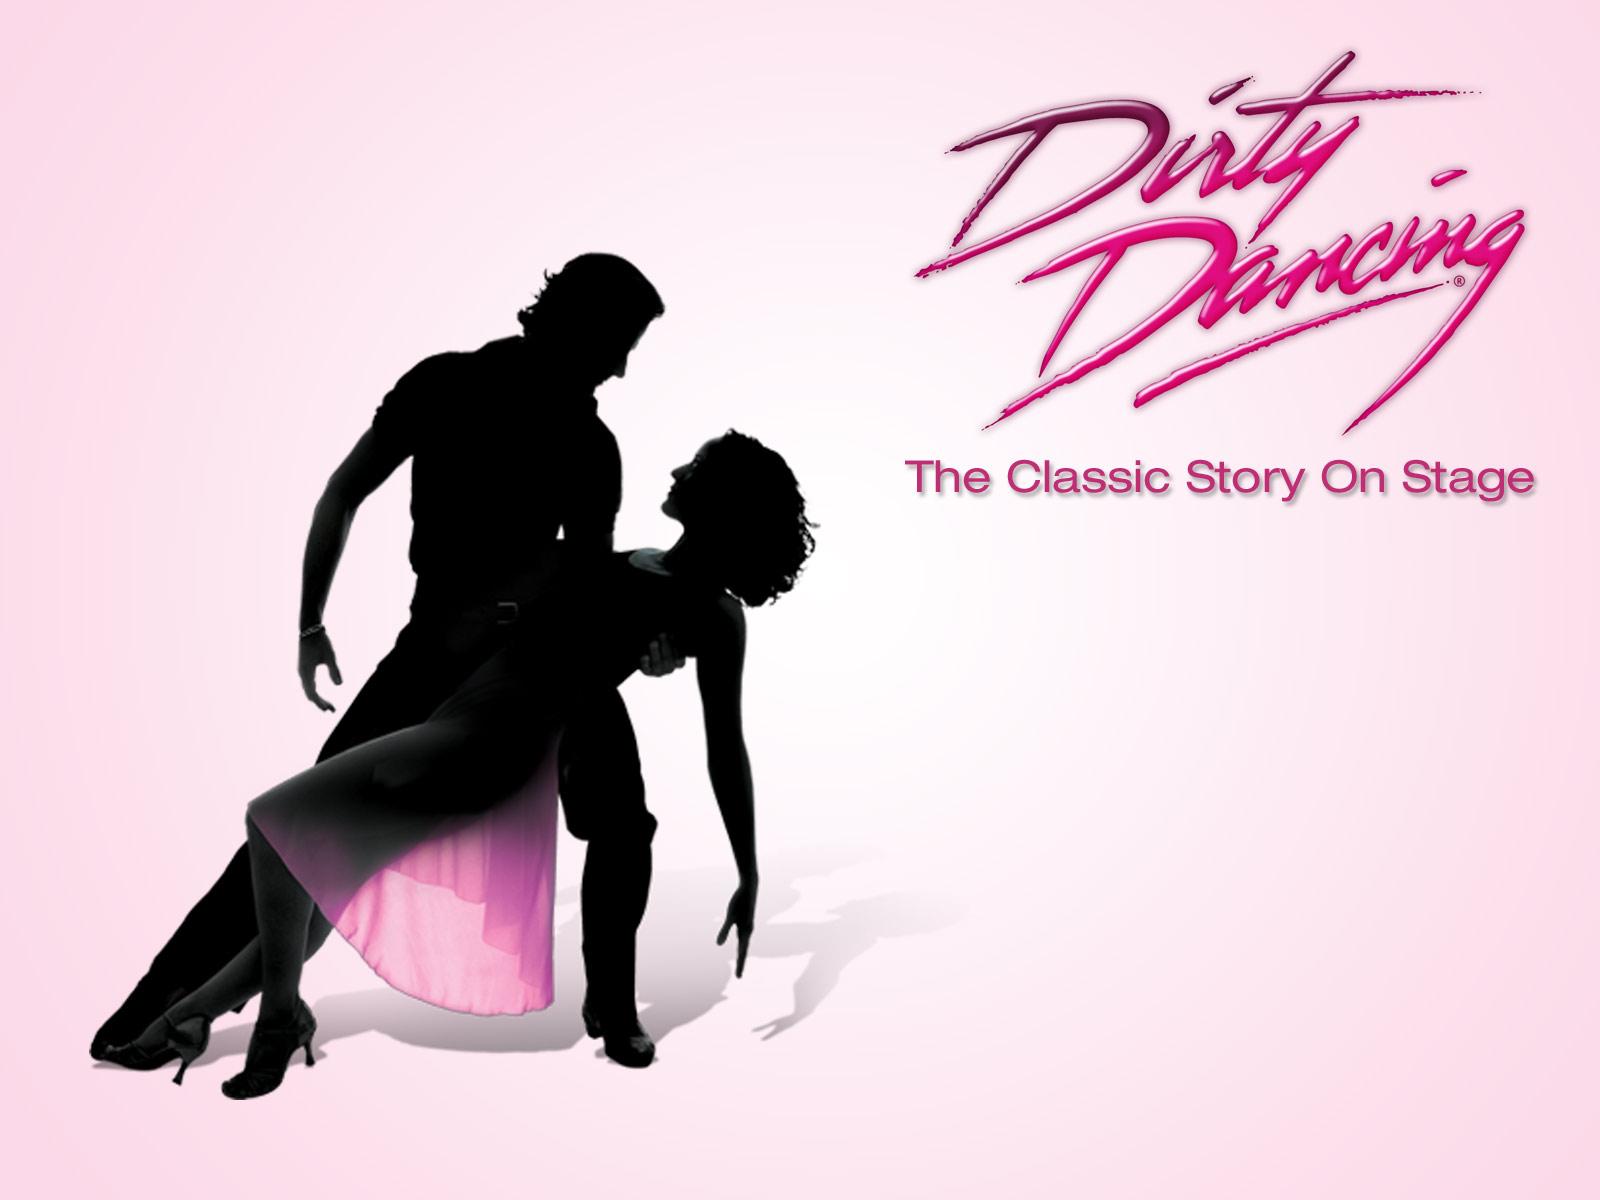 Get Dirty Dancing Wallpaper [1600x1200] for your Desktop Mobile 1600x1200